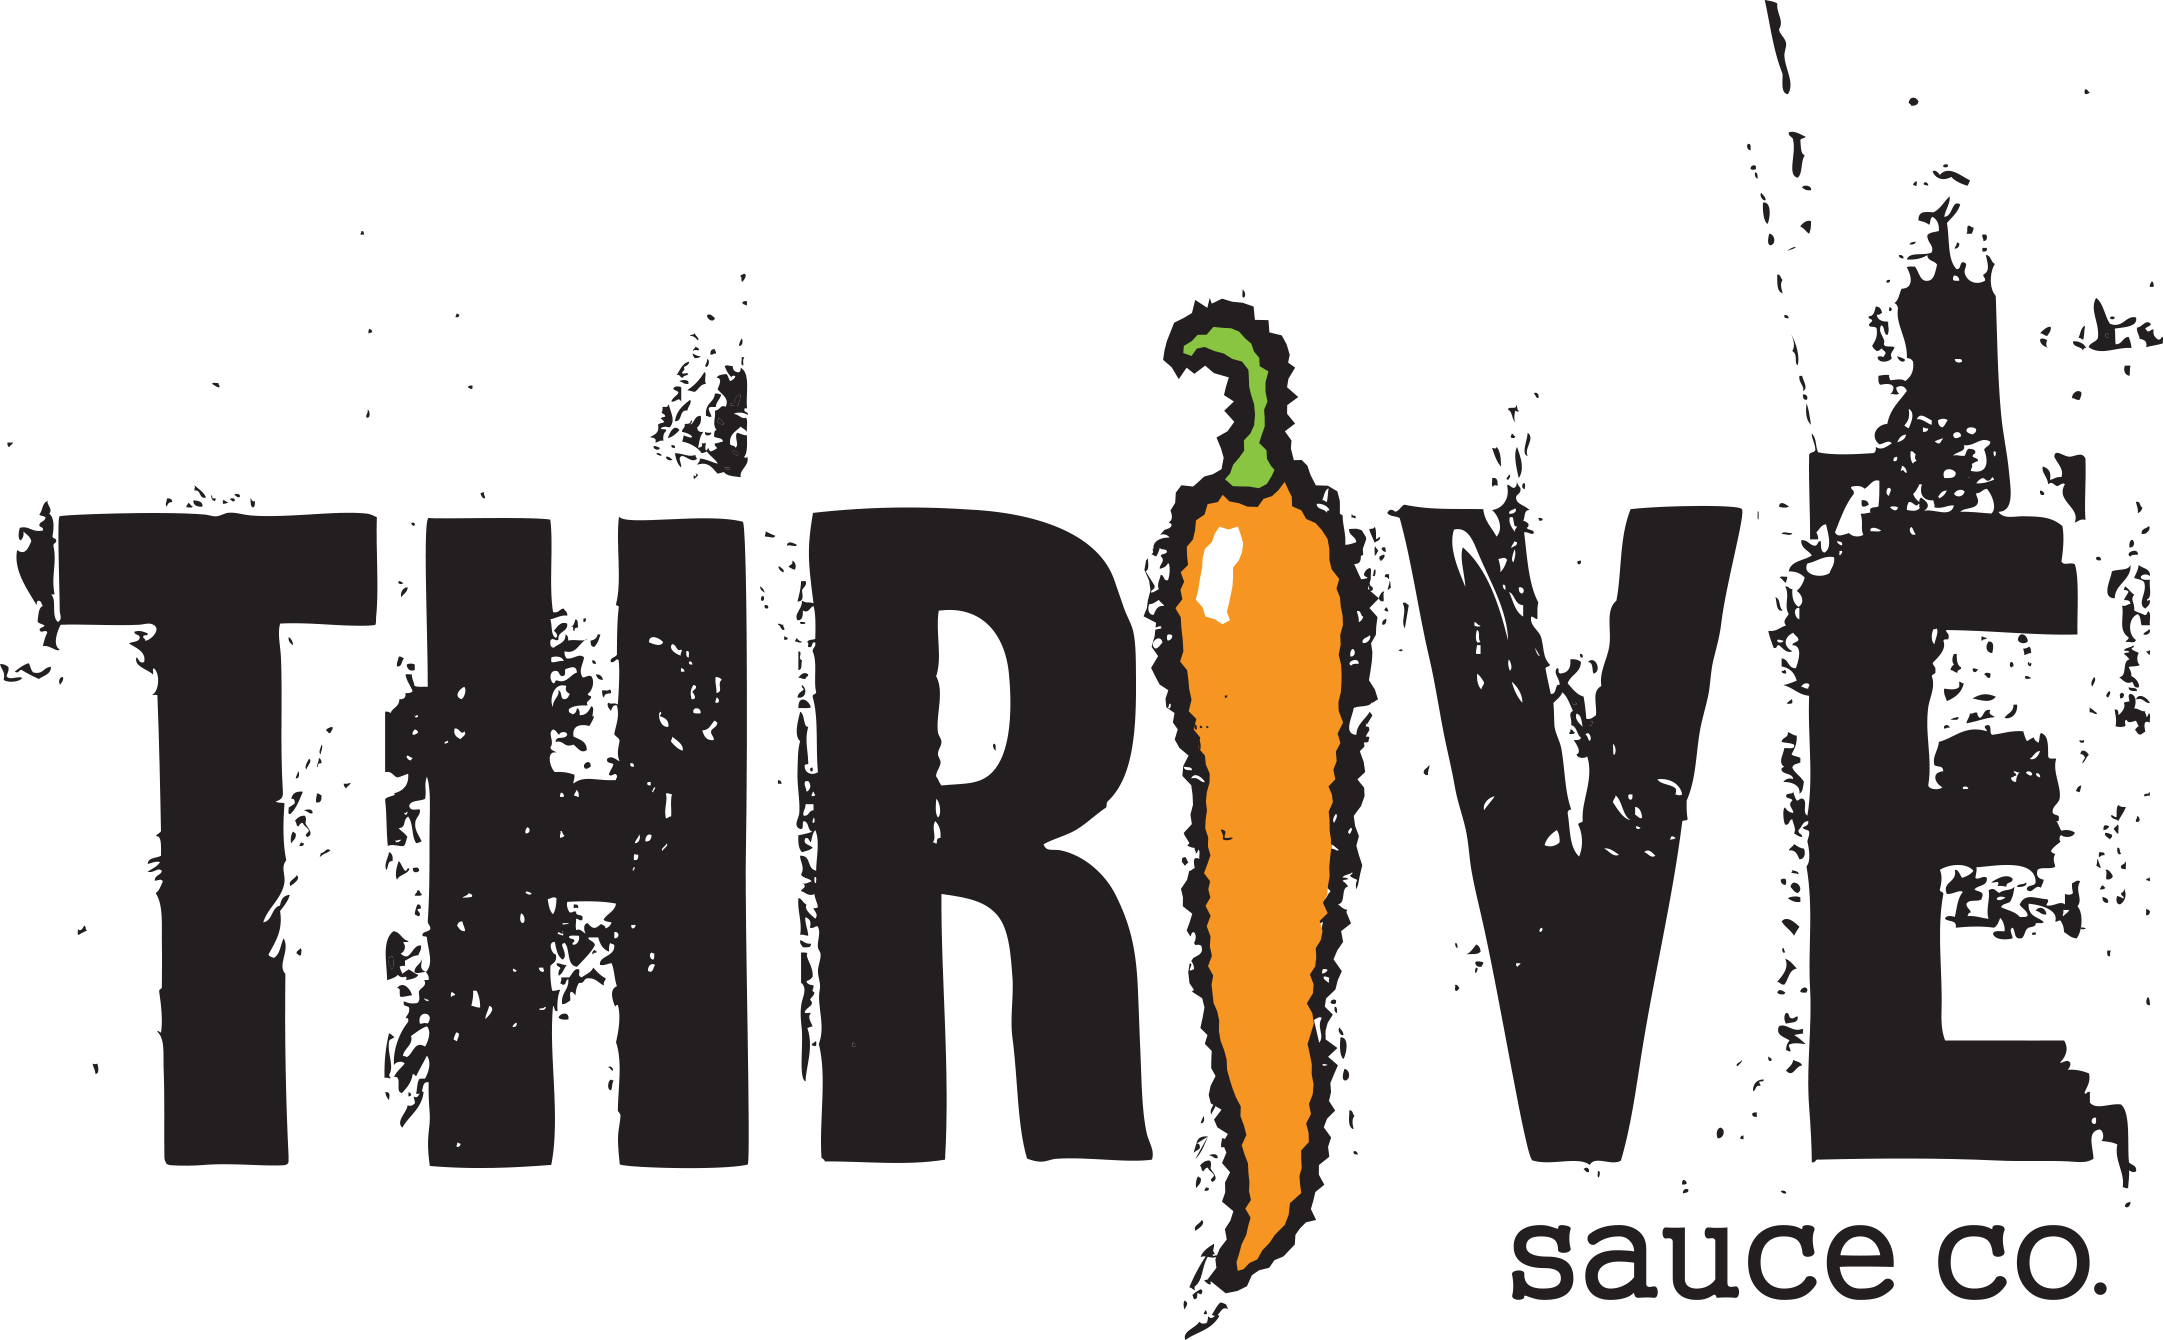 Thrive Sauce Co